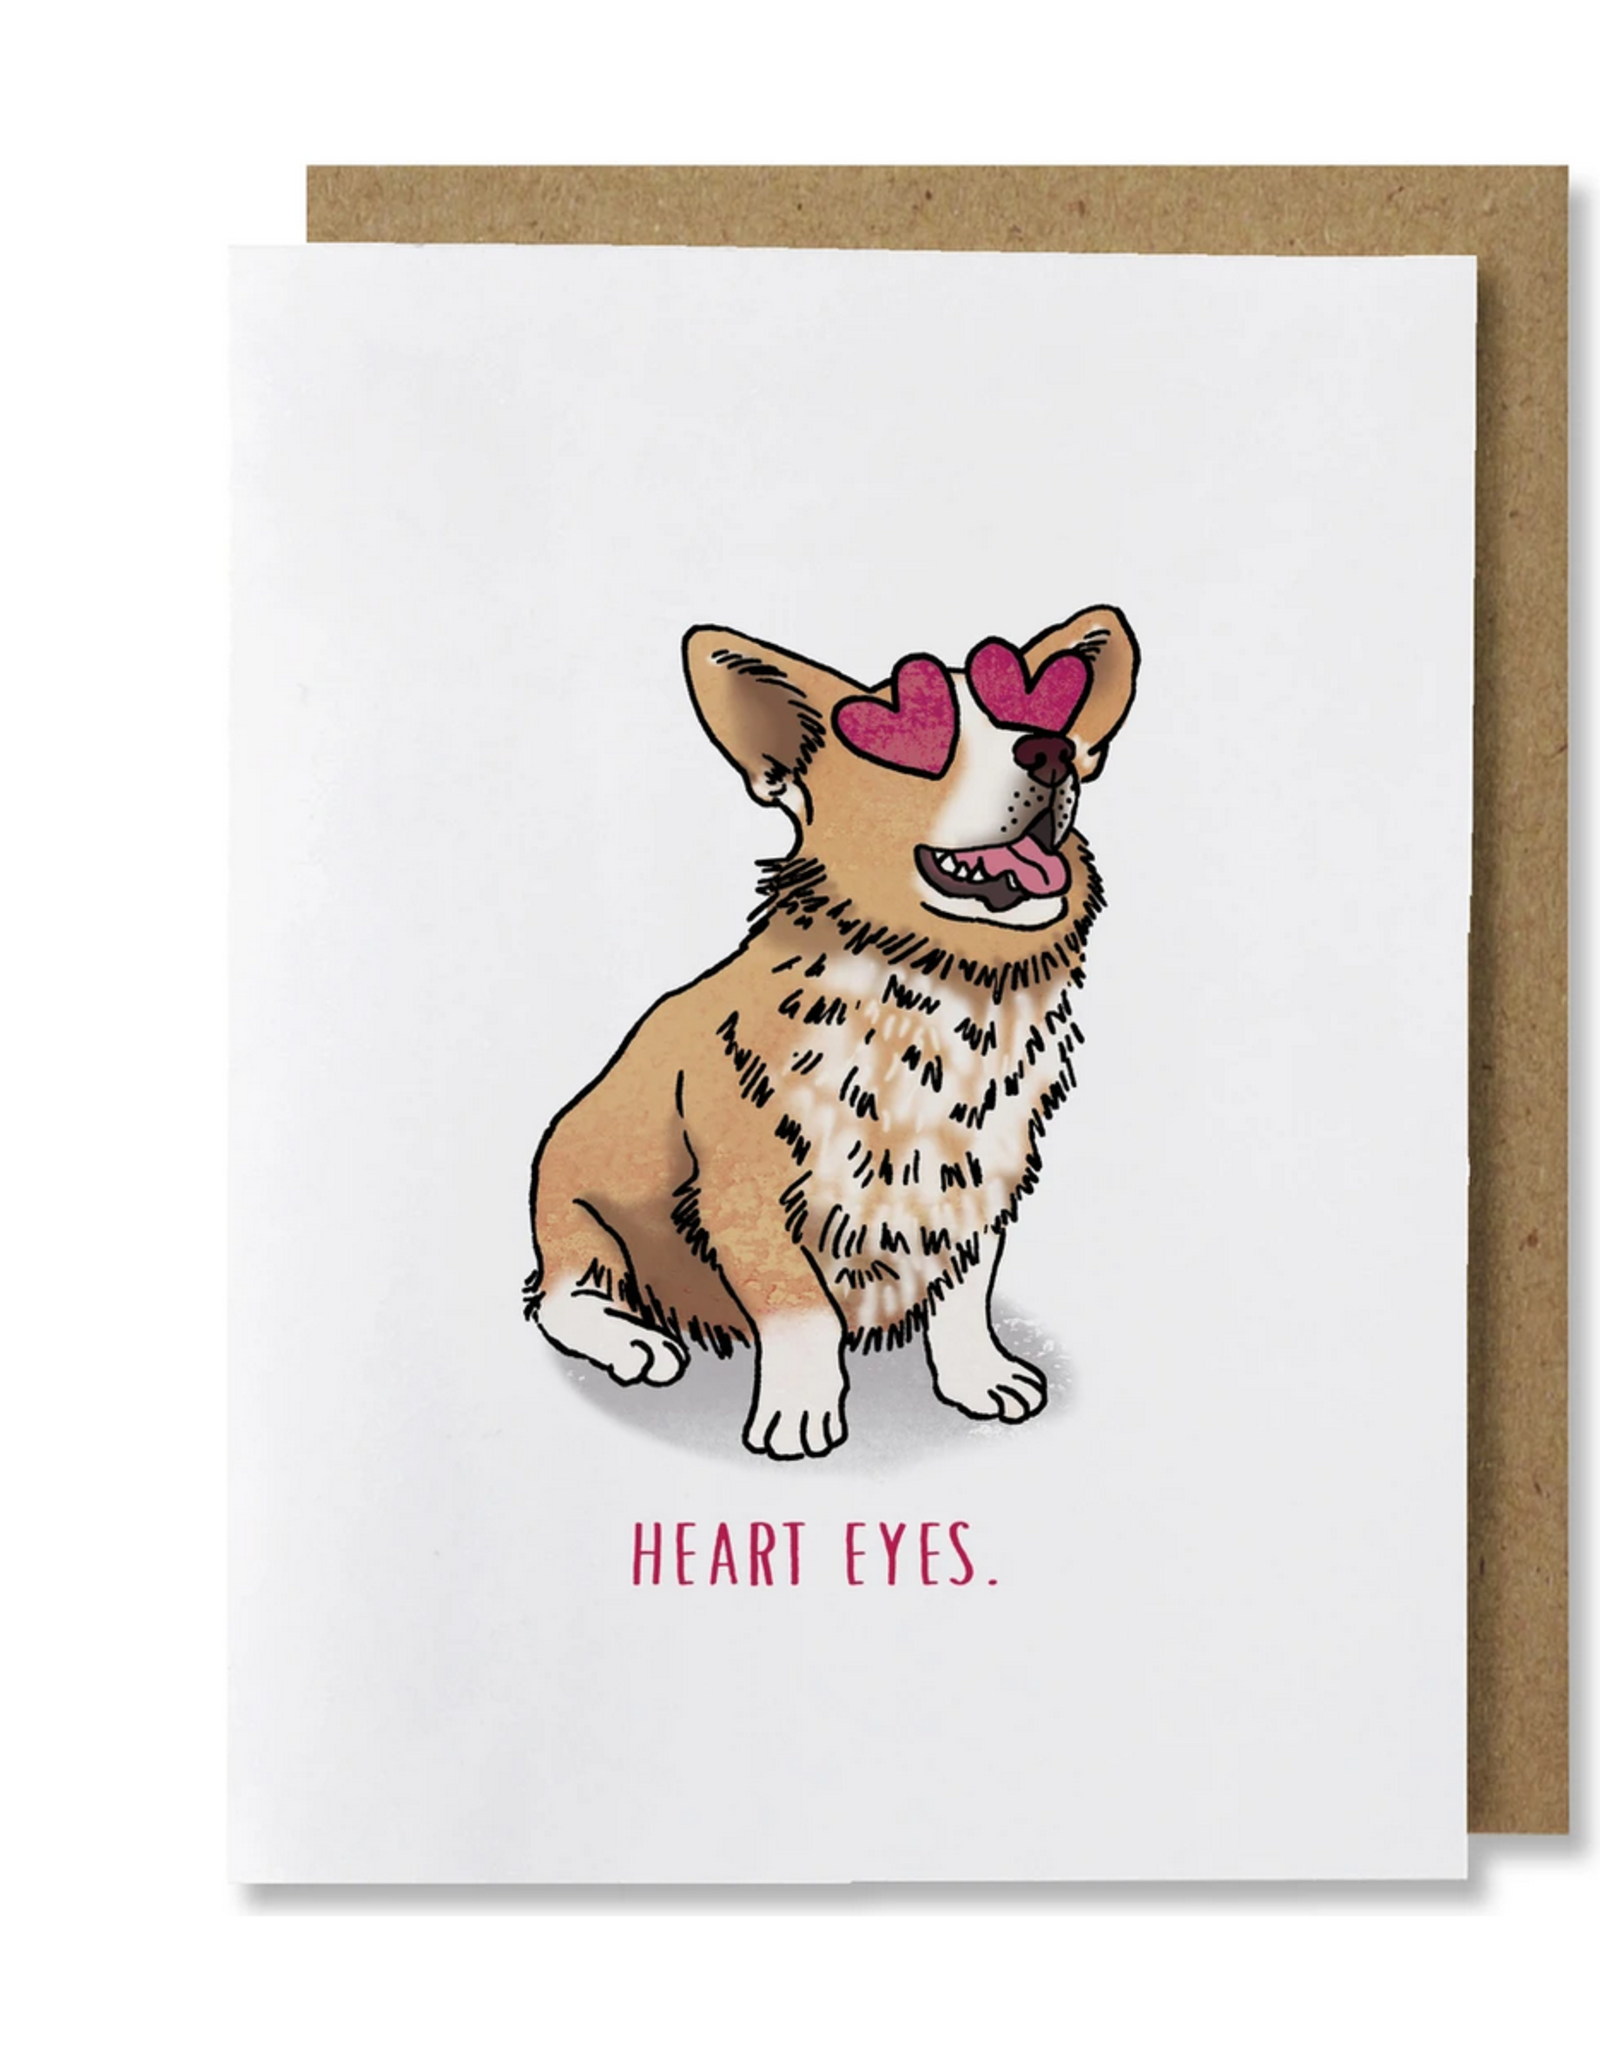 Heart Eyes Greeting Card